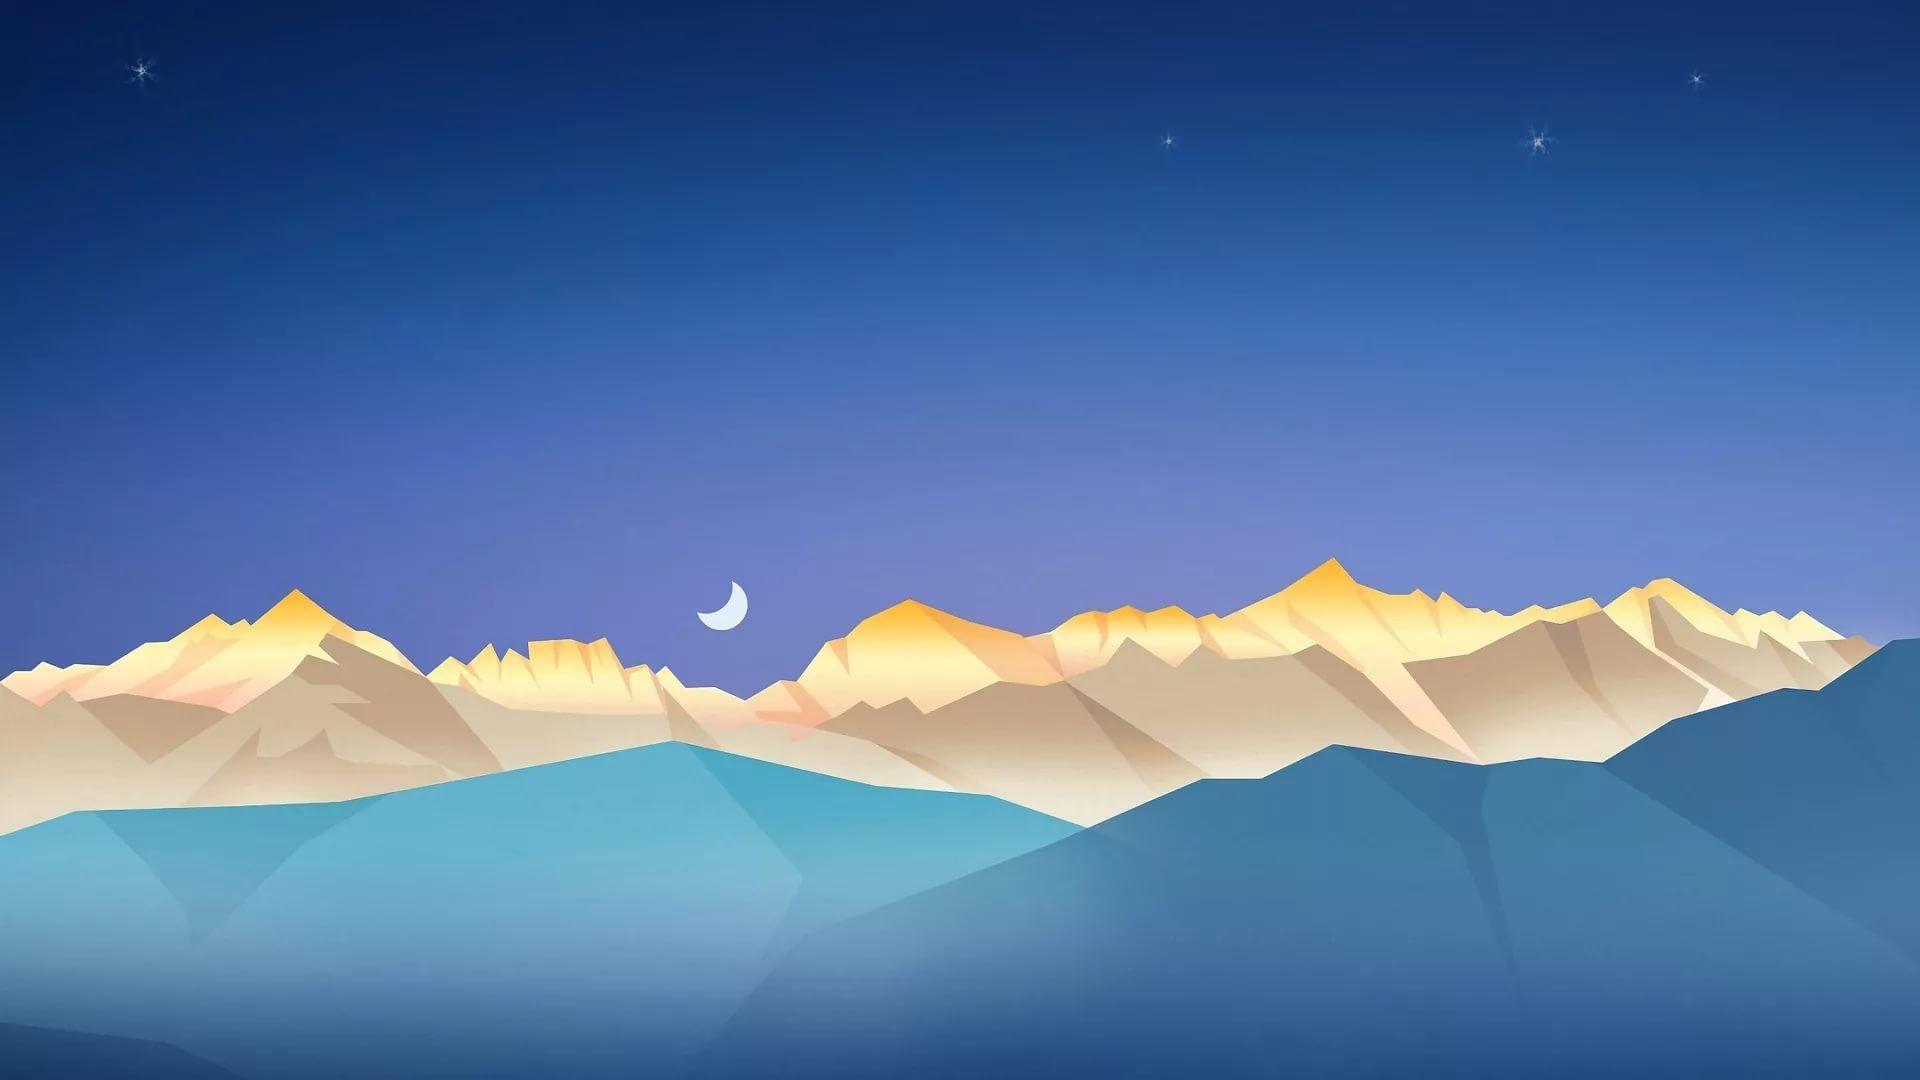 Minimalist Desktop wallpaper and themes